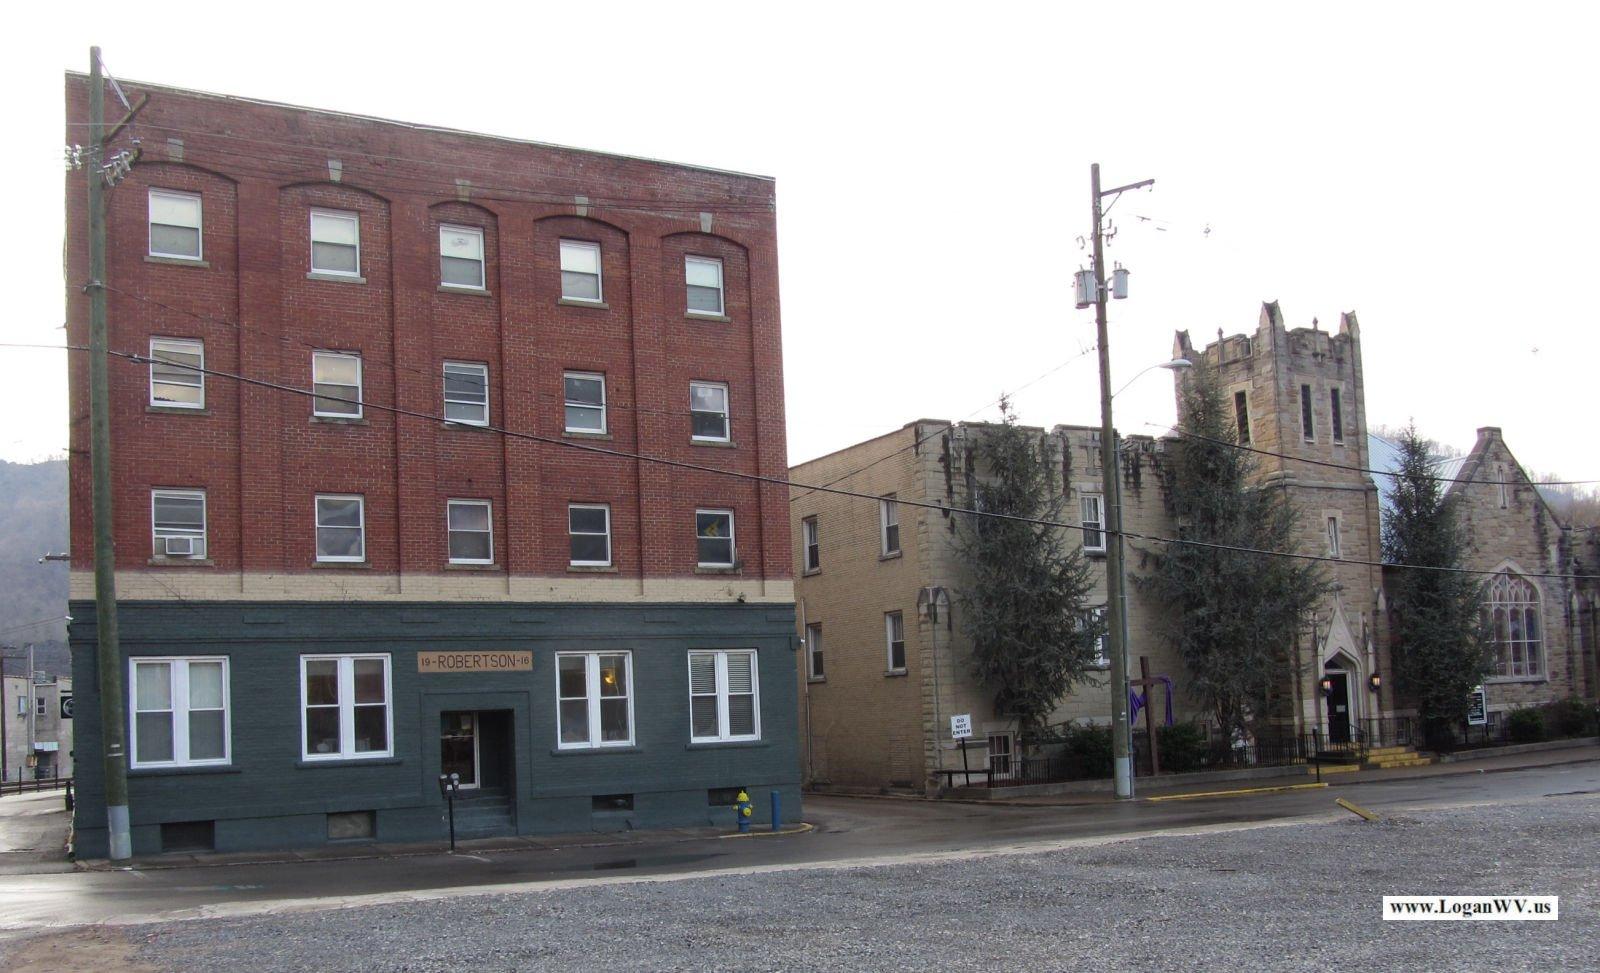 Cole Street, Logan, WV taken 3-25-2014